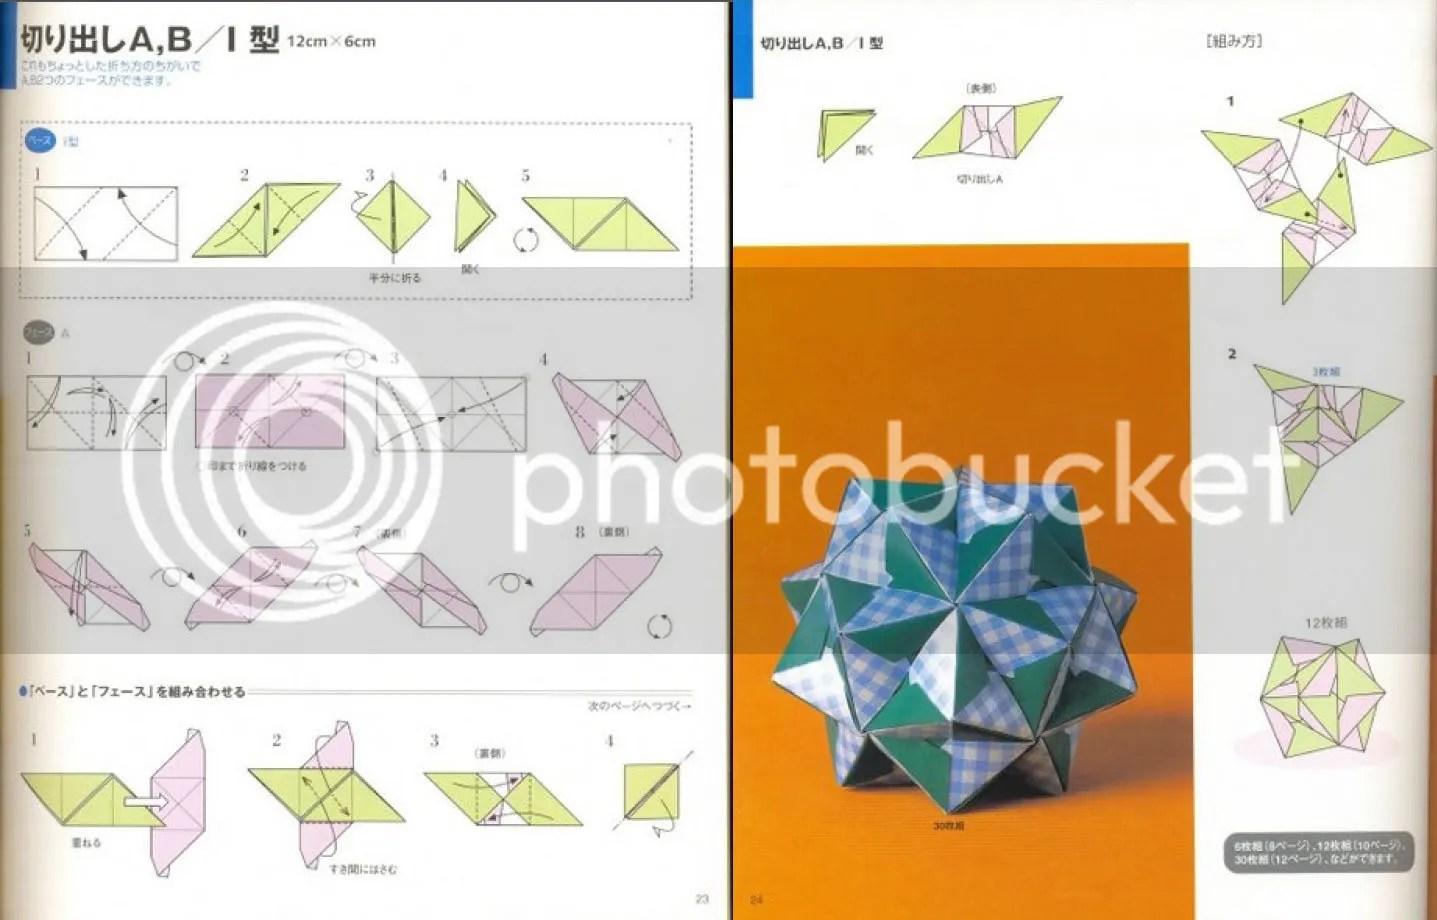 hight resolution of tomoko fuse diagrams 5 9 petraoberheit de u2022tomoko fuse diagrams